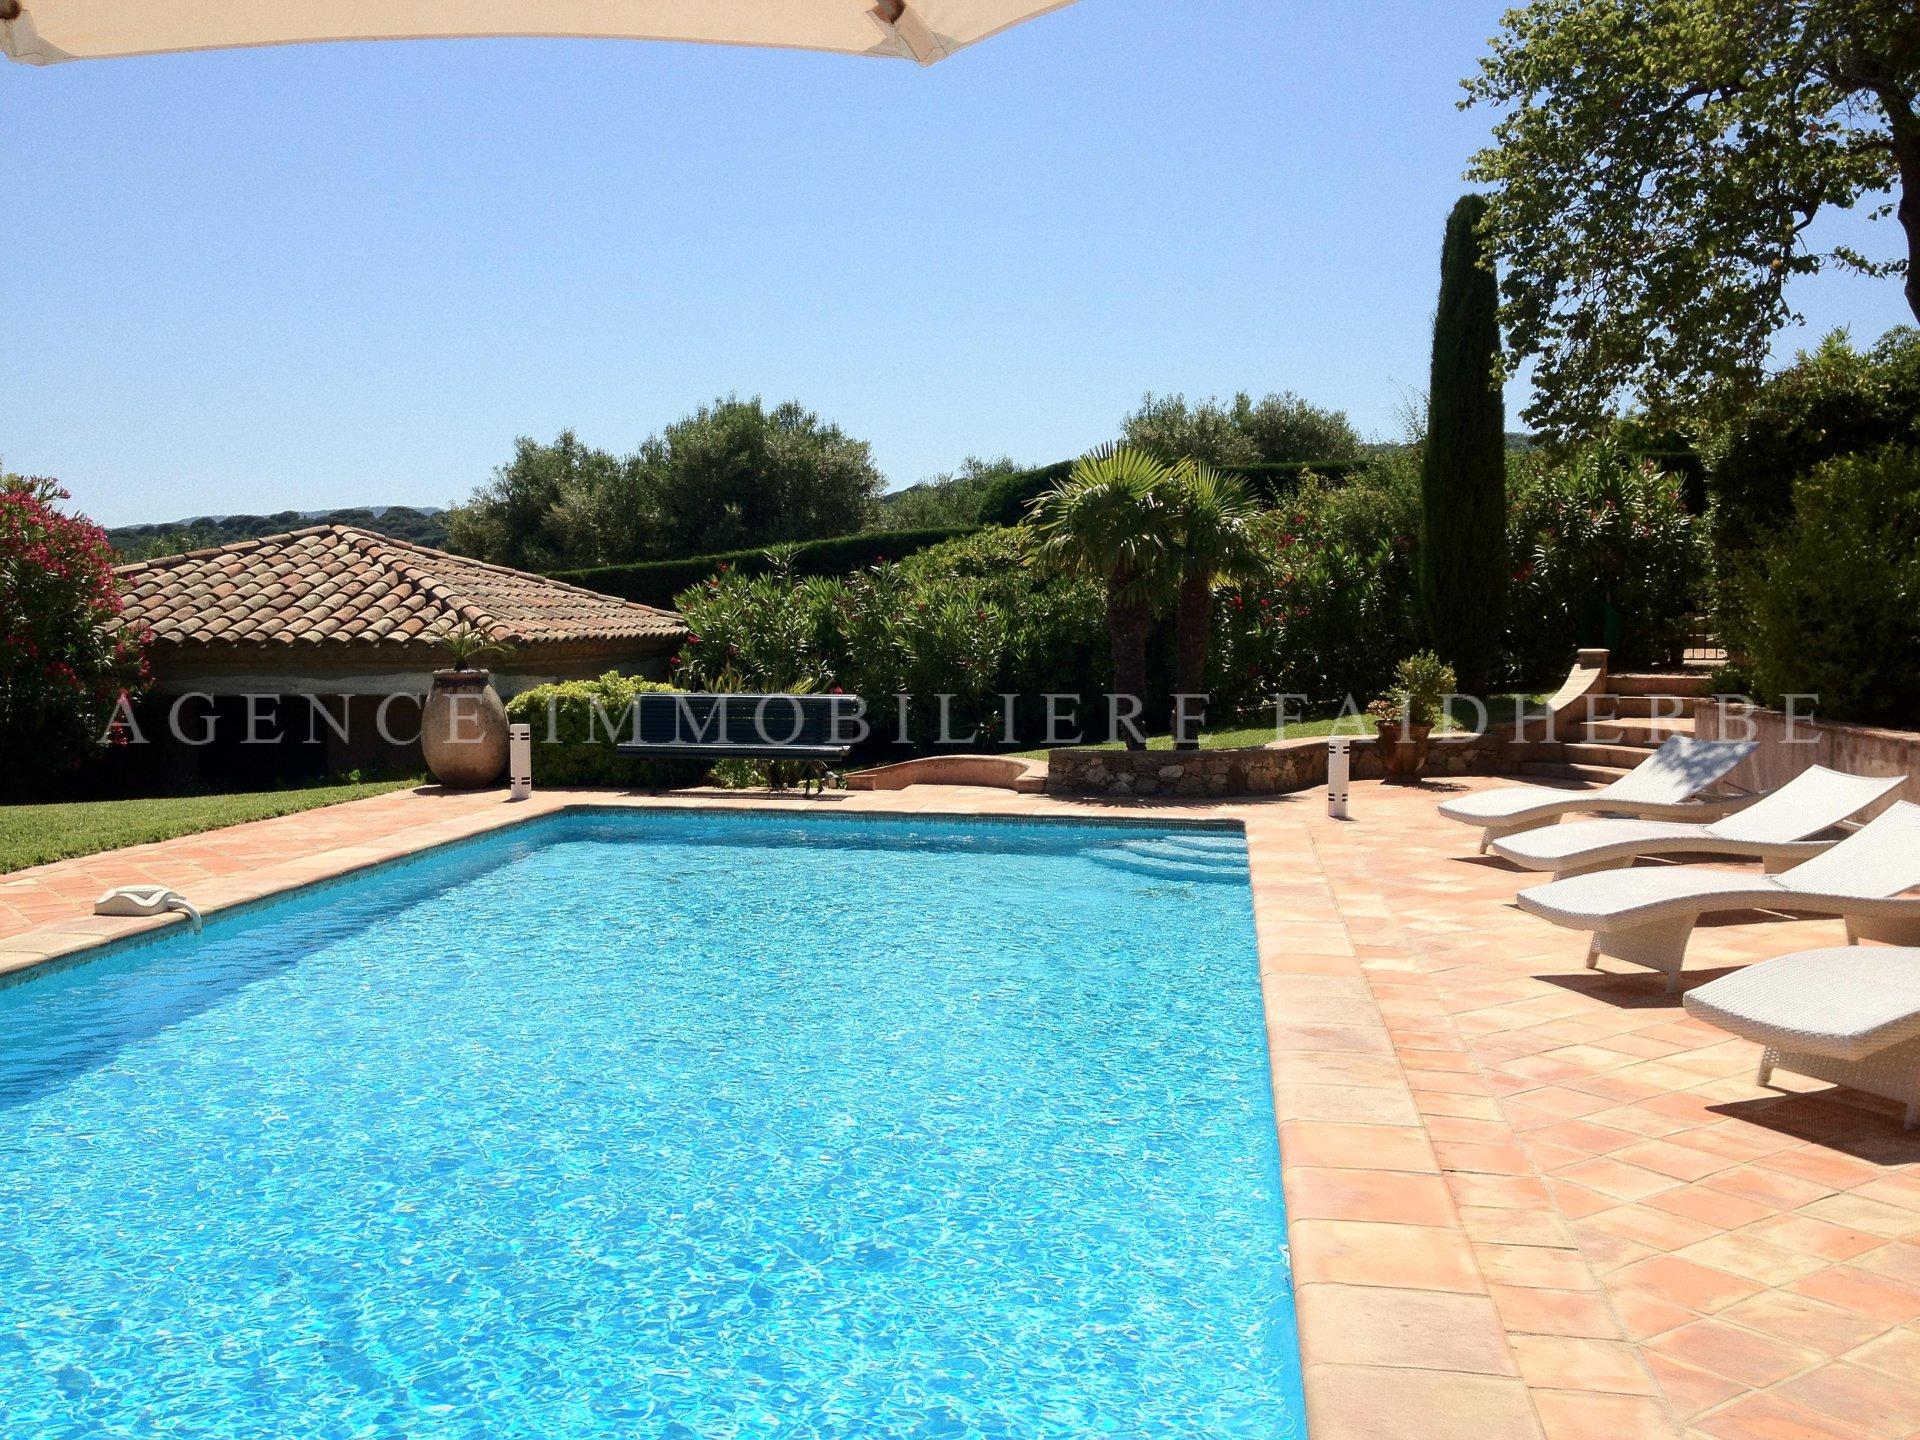 Route des plages, villa provenzale con vista mare